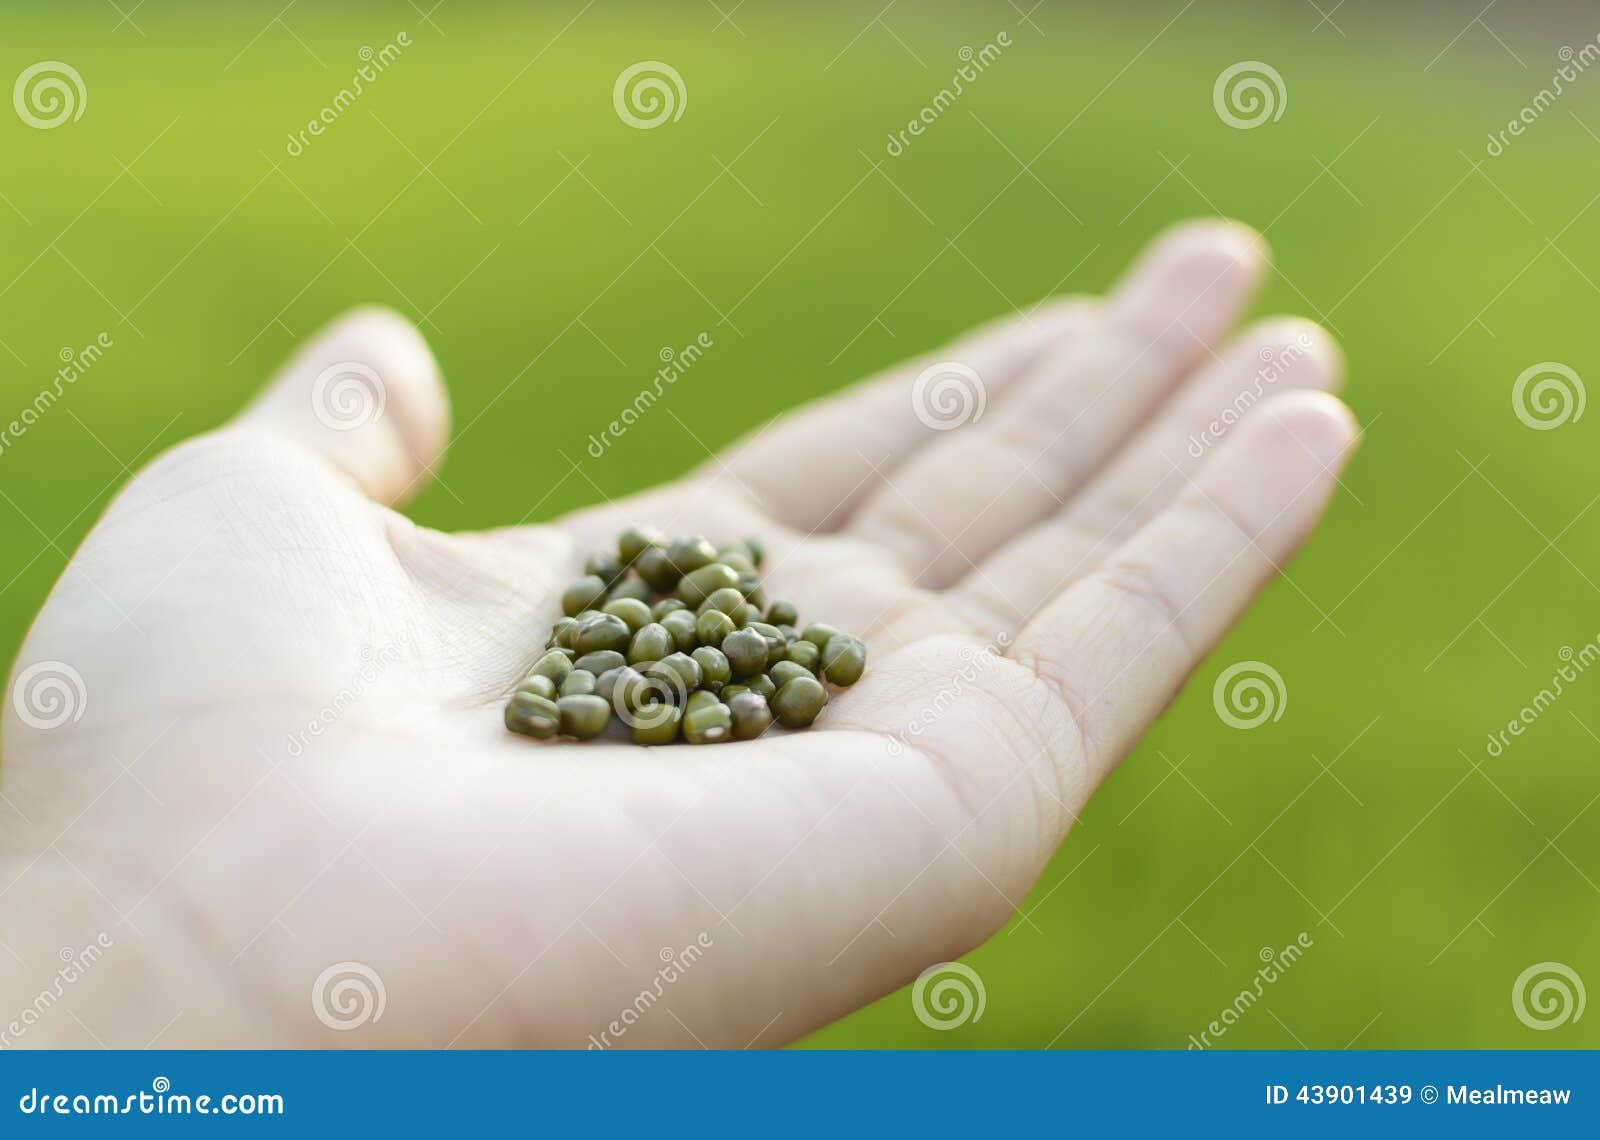 graine de haricot vert en main photo stock image 43901439. Black Bedroom Furniture Sets. Home Design Ideas